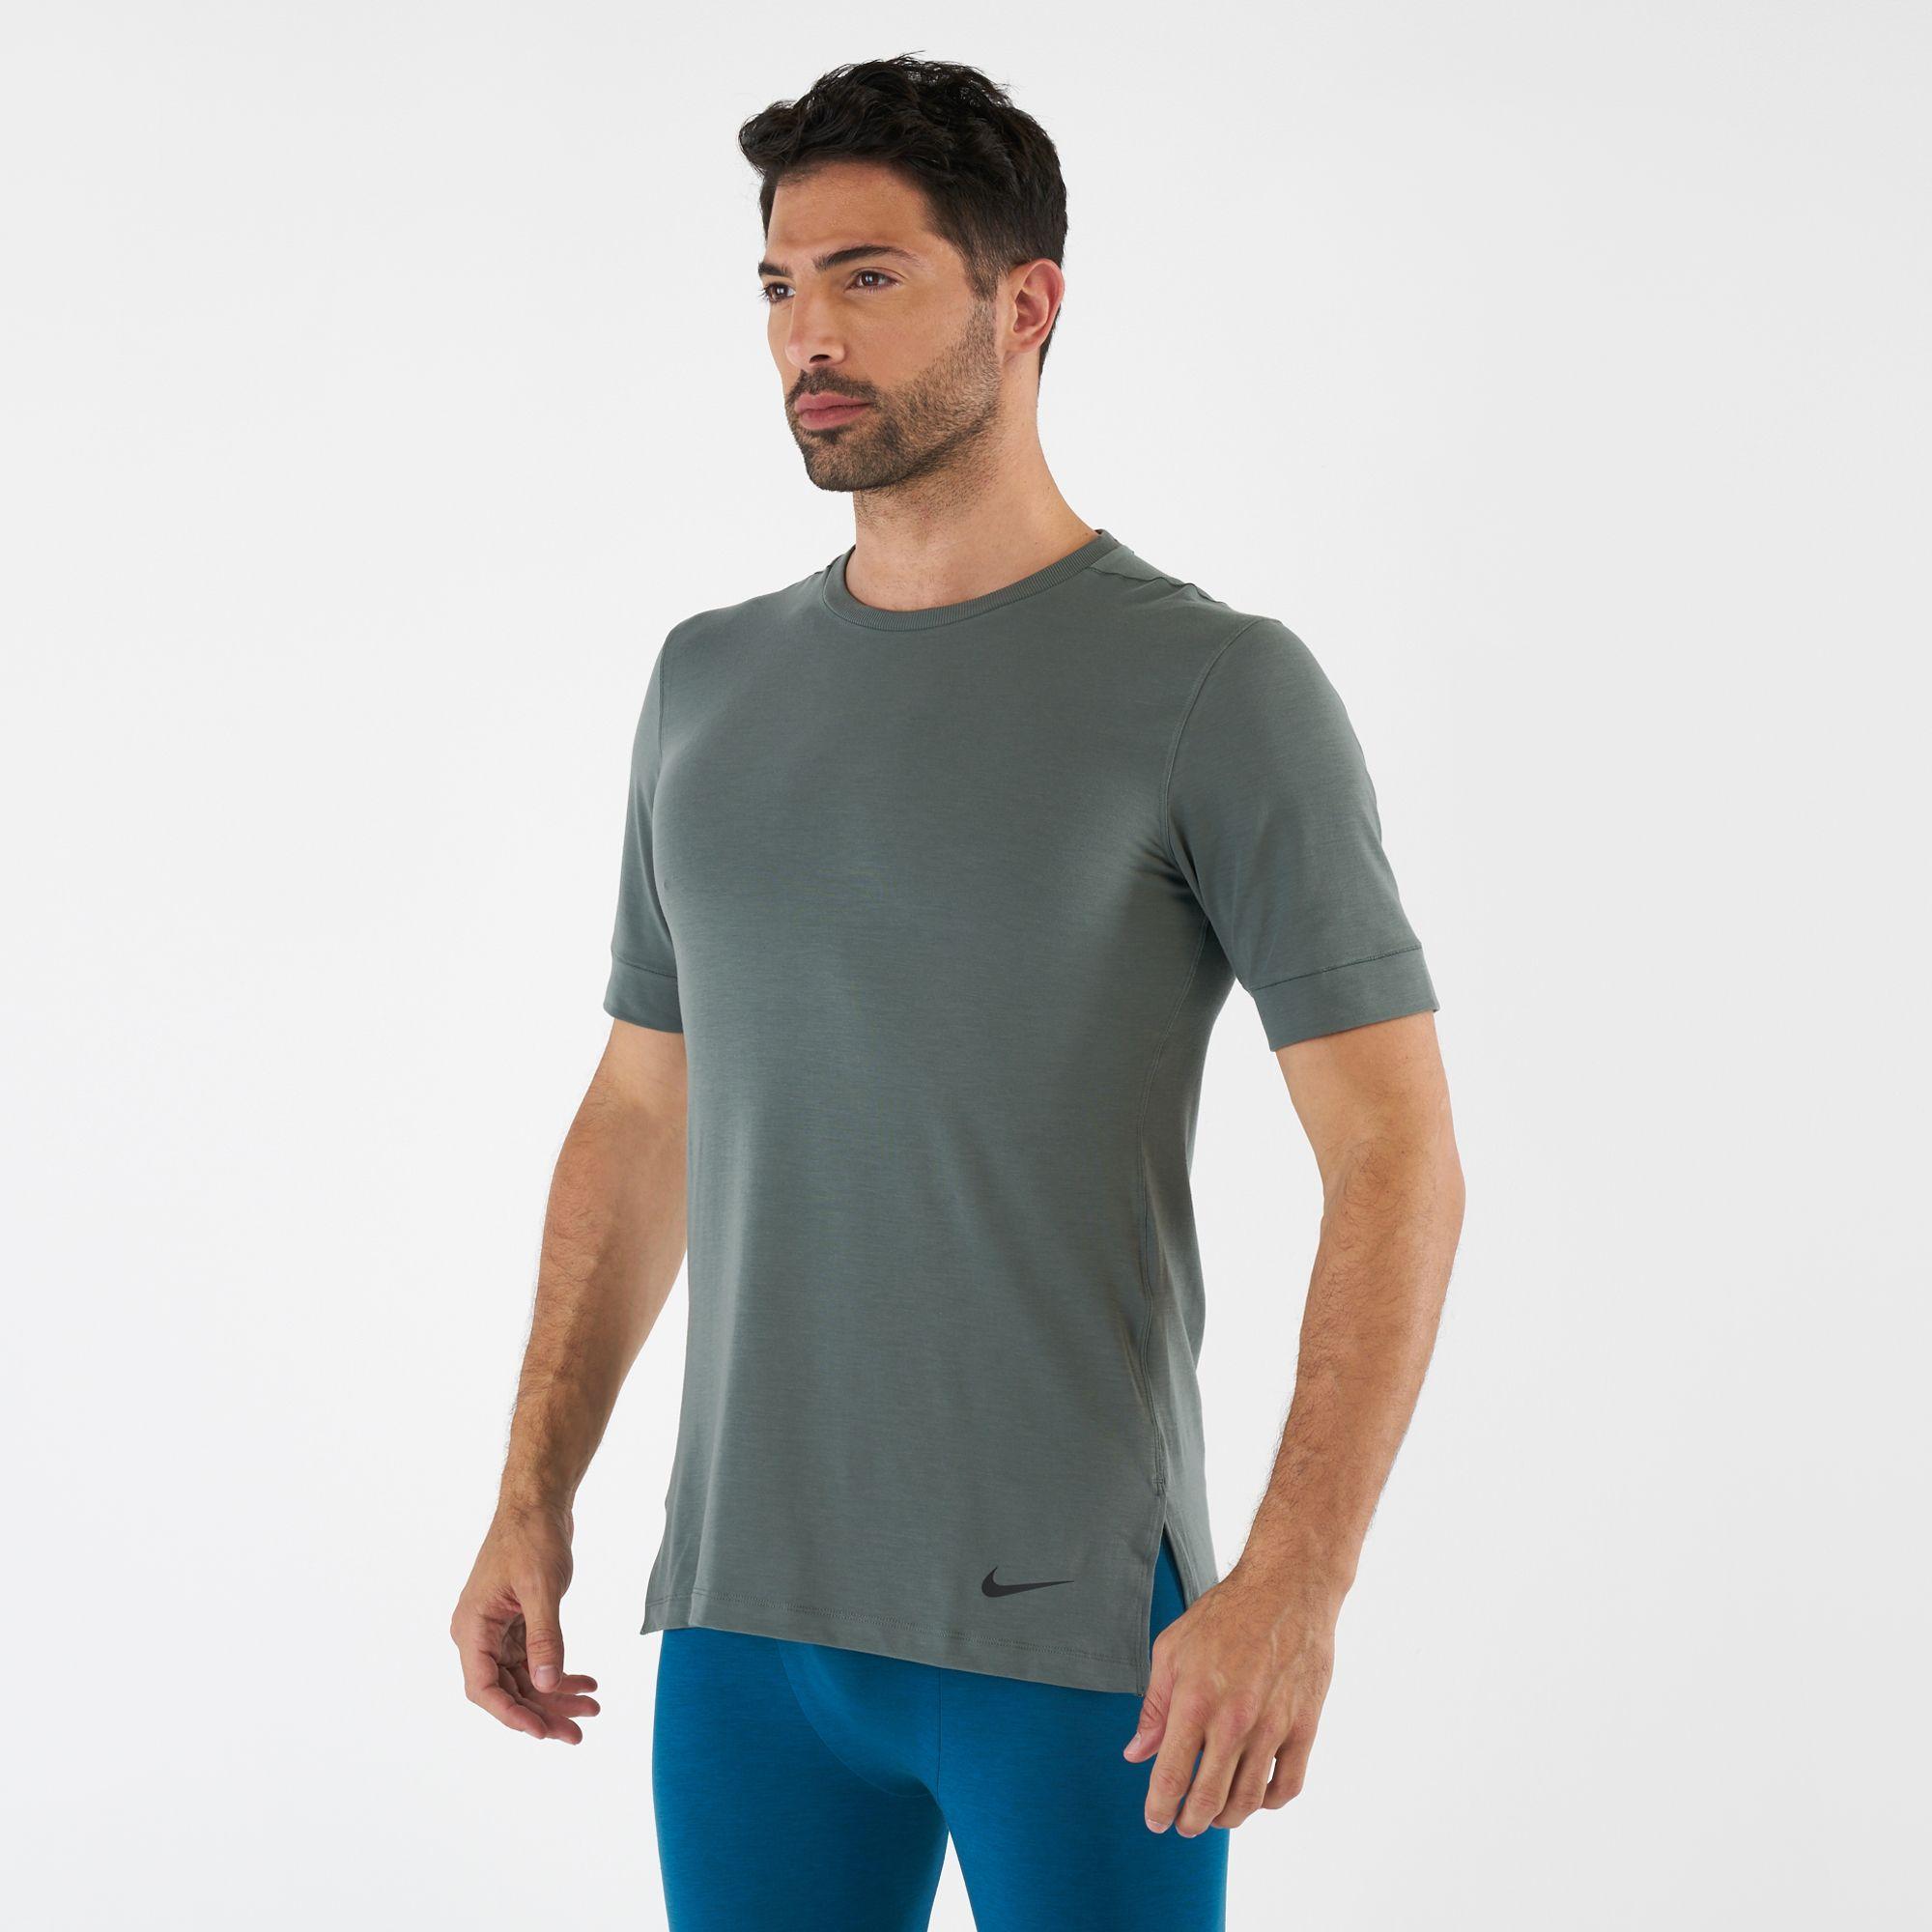 281e915dd8e Nike Mens Workout T Shirts - Gomes Weine AG